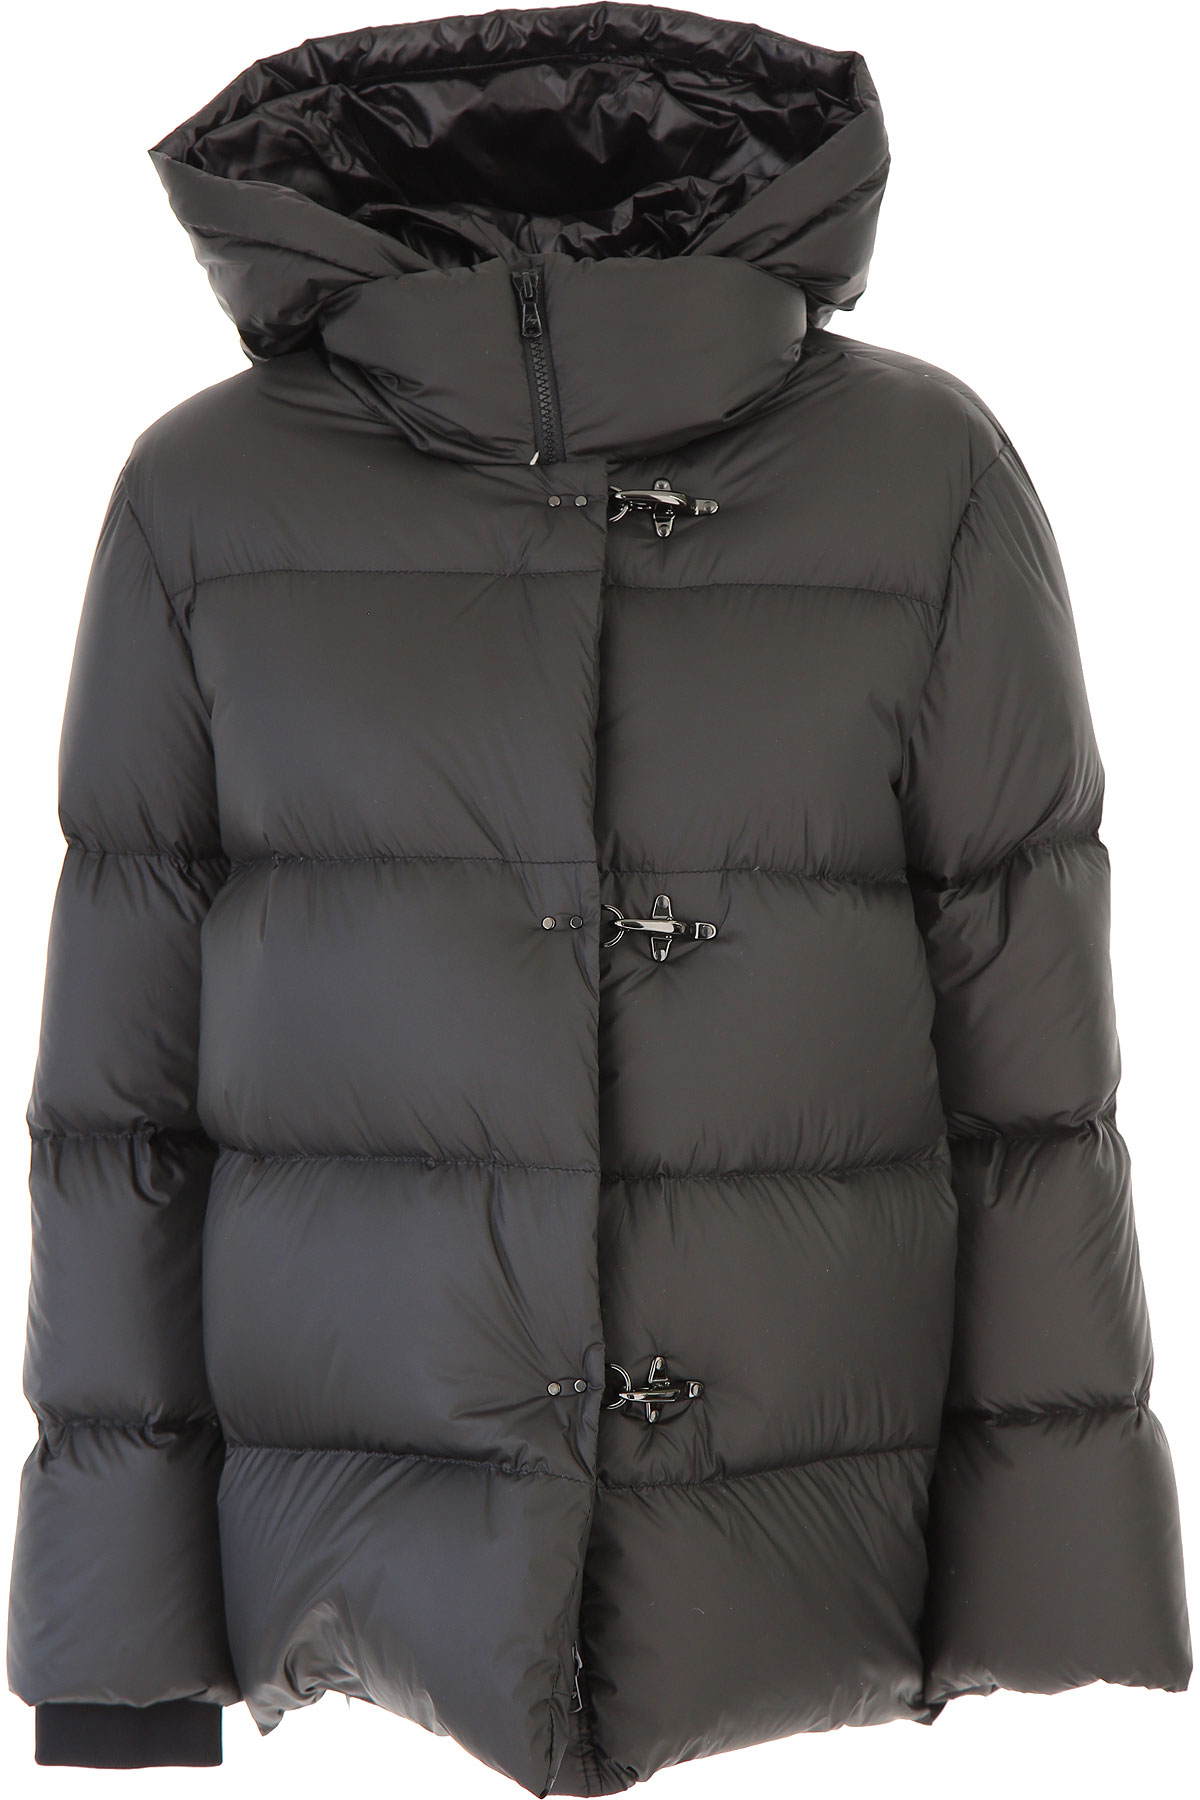 Fay Down Jacket for Women, Puffer Ski Jacket On Sale, Black, Down, 2019, 4 6